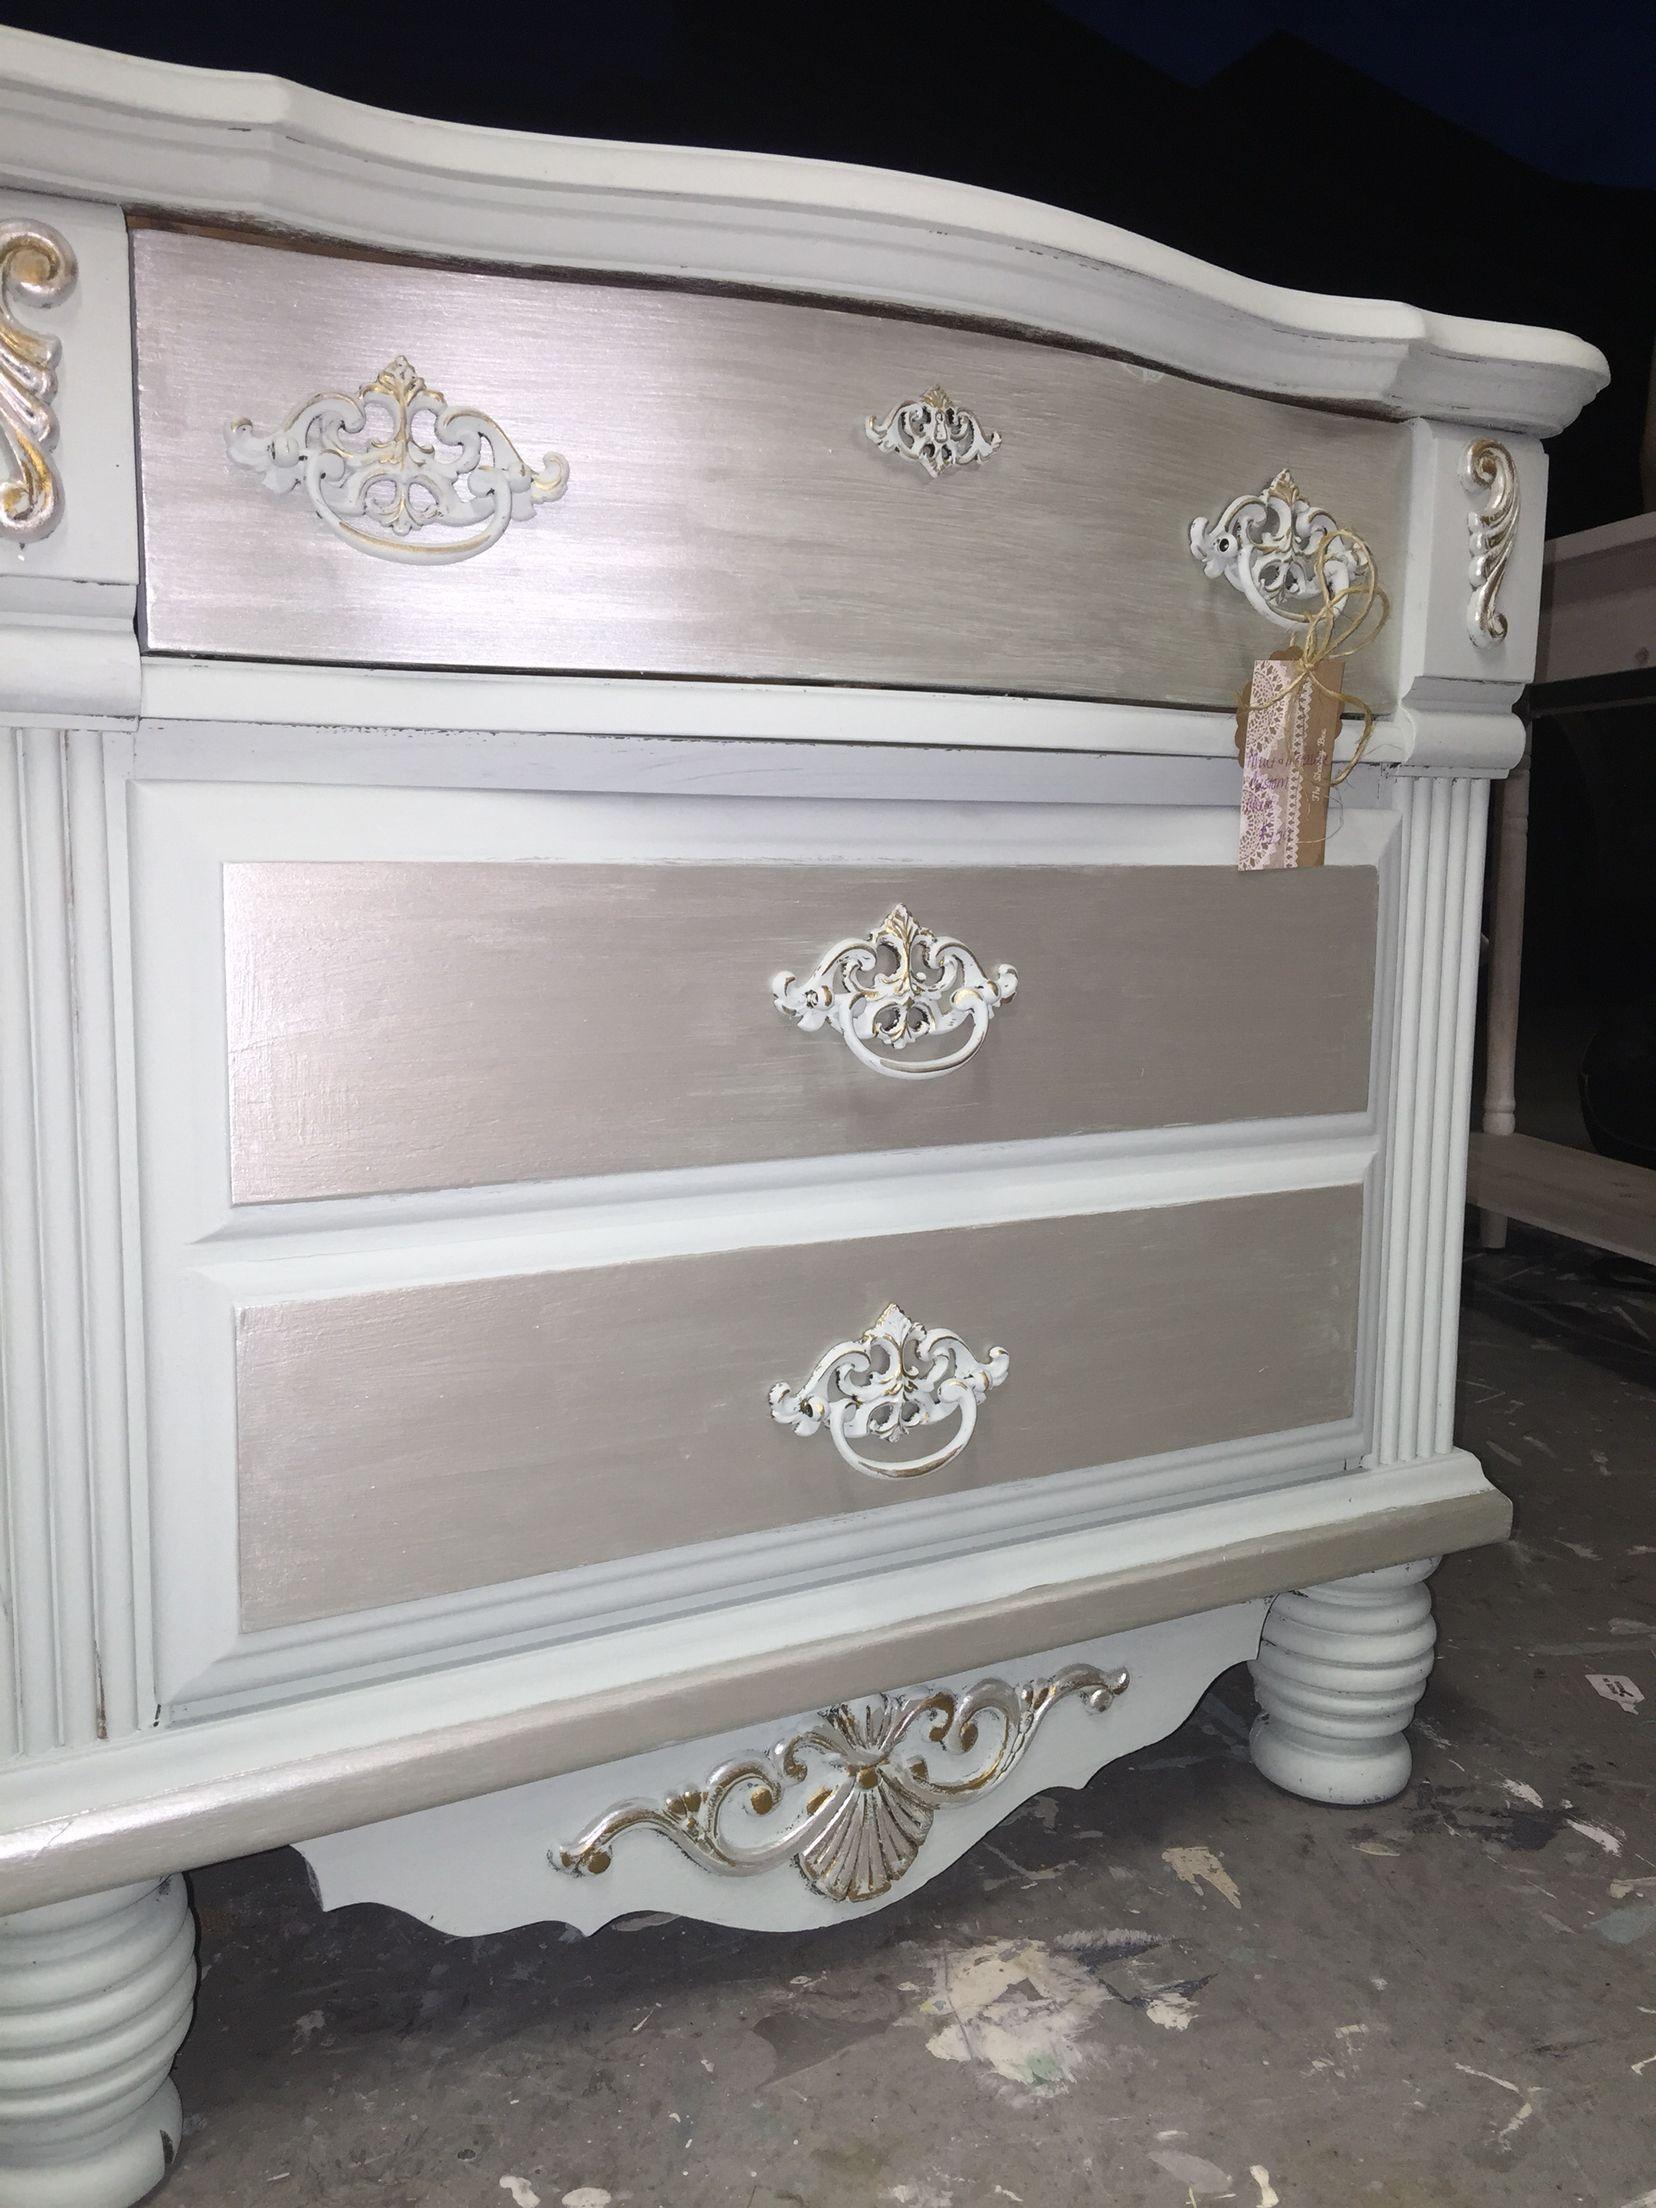 usa global in drawer web catalina metallic d dresser furniture white